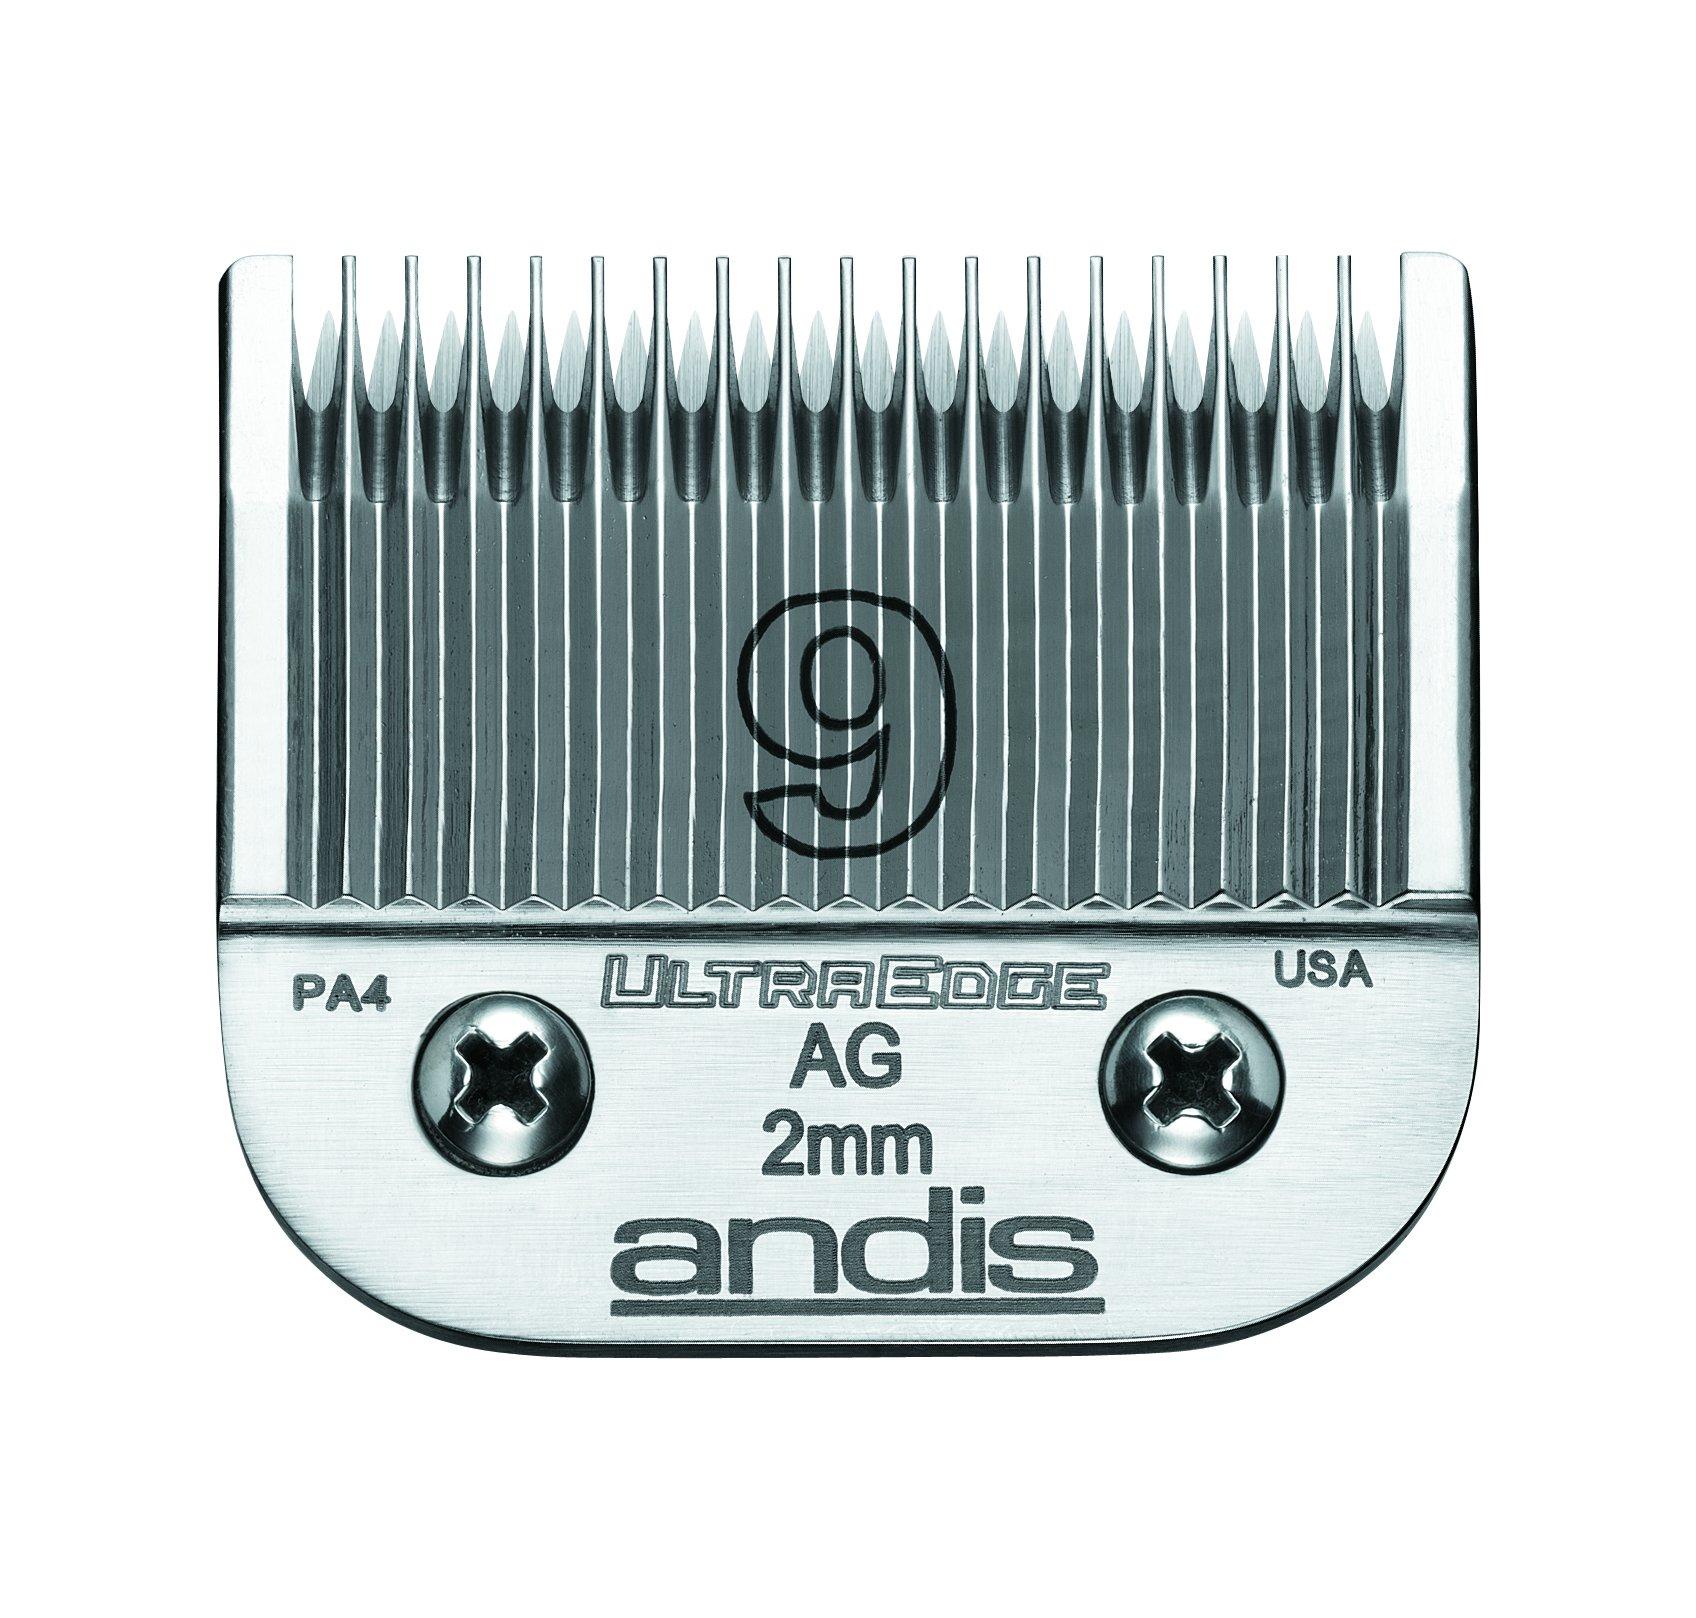 Cuchillas : Andis 9 Ultra Edge 64120 Reemplazo